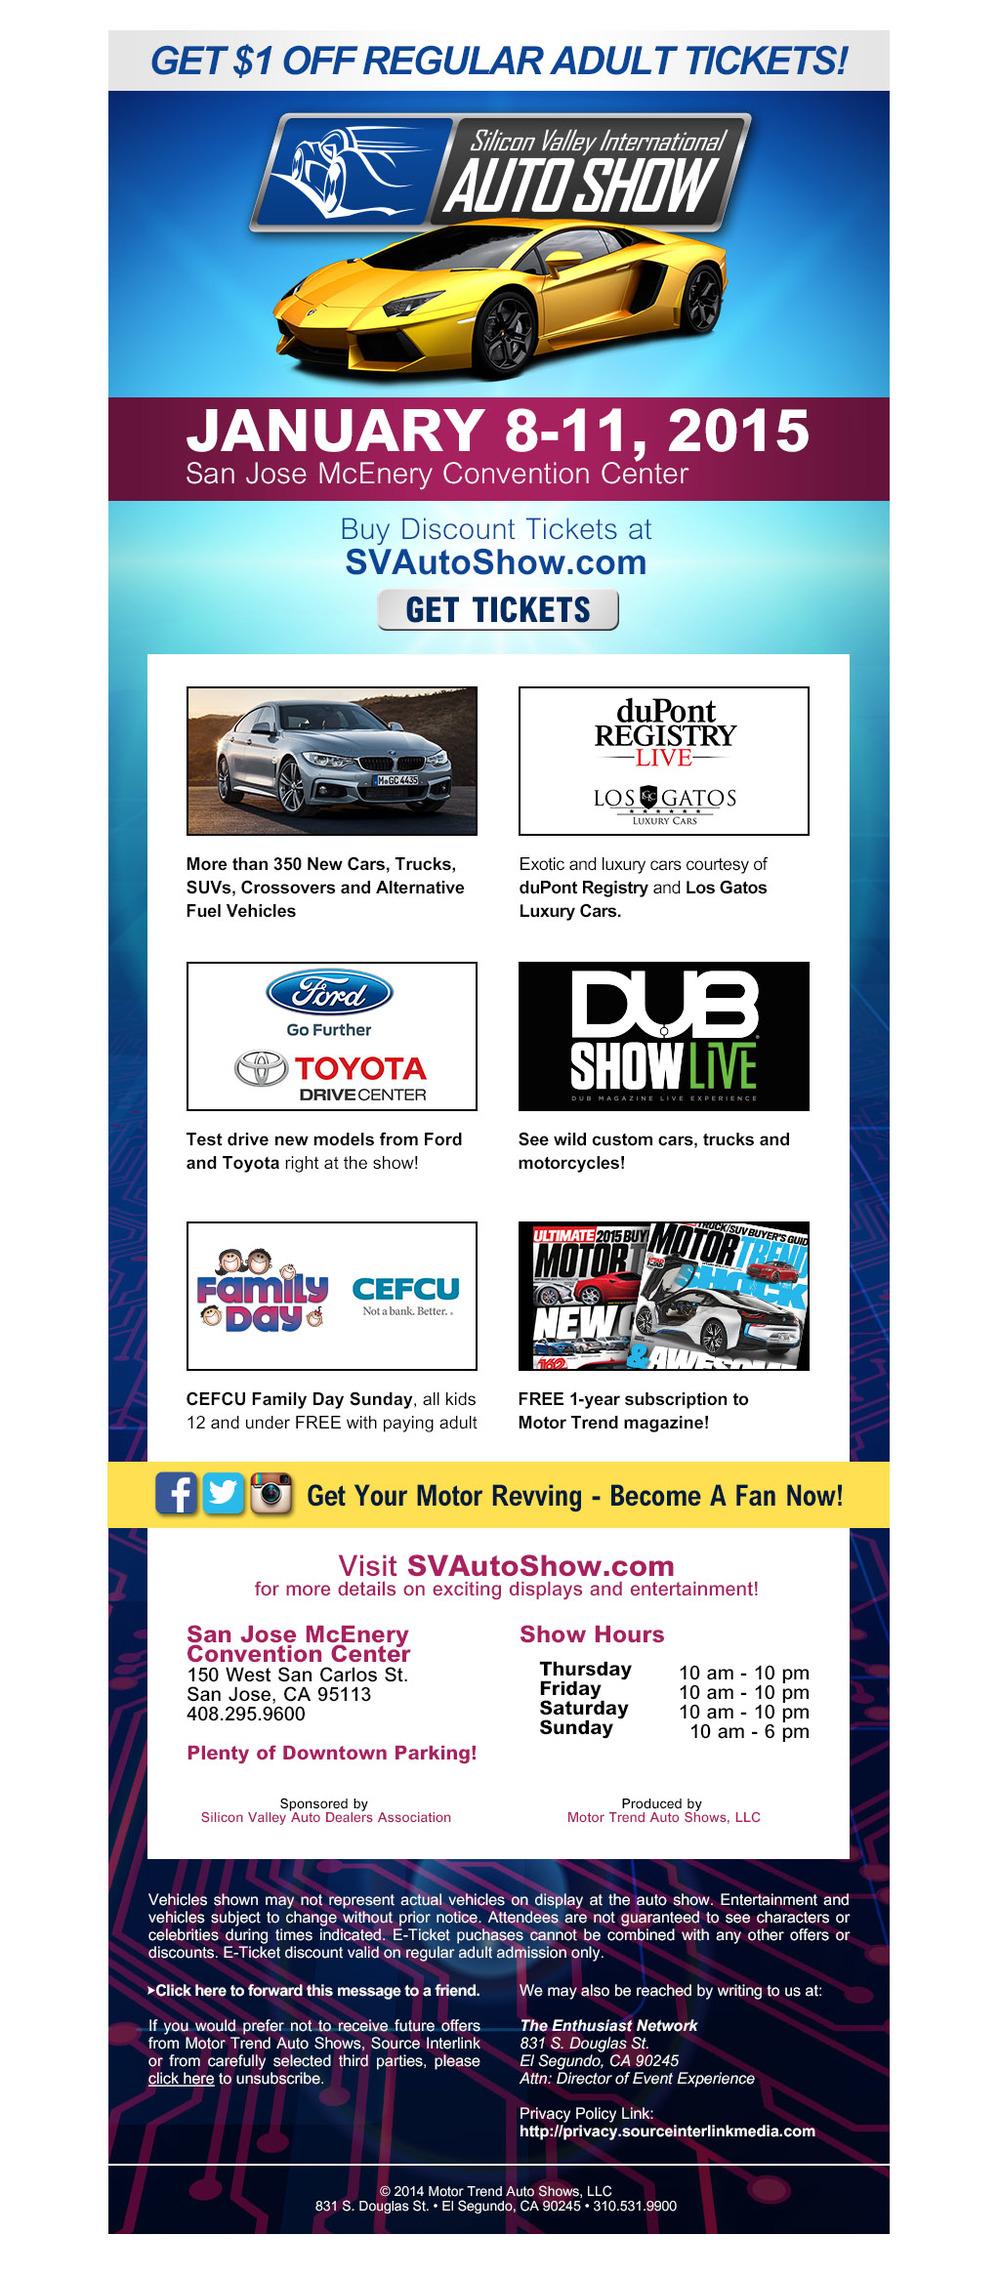 Silicon Valley International Auto Show Eblast